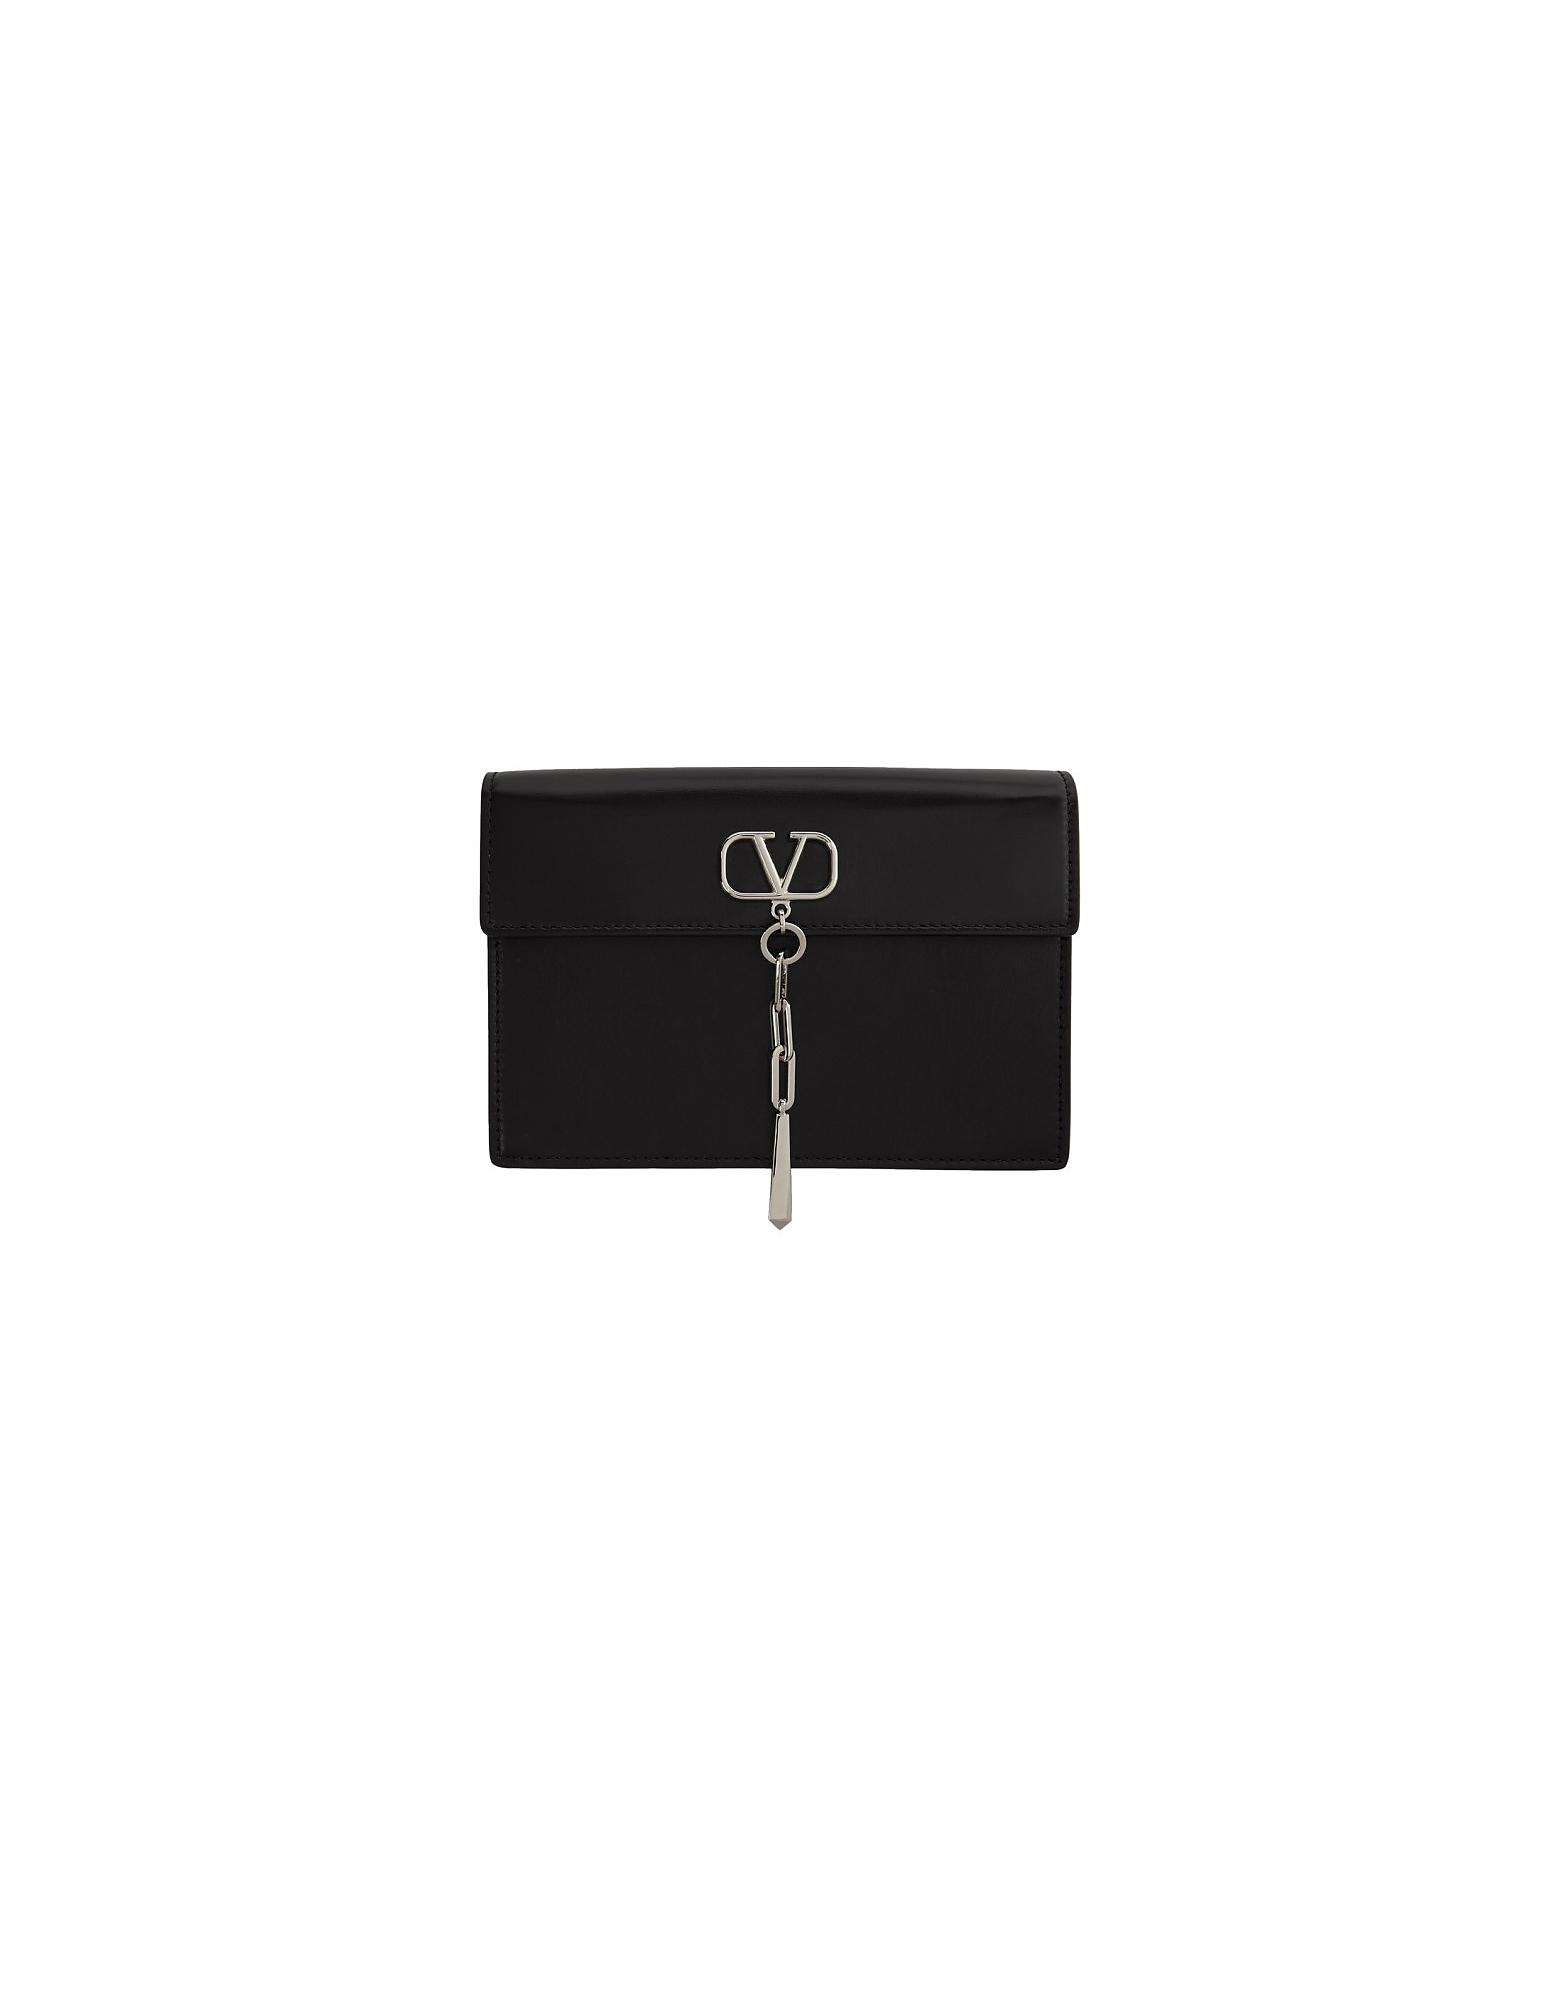 Valentino Designer Handbags, Black Valentino Garavani Small VLogo Pouch